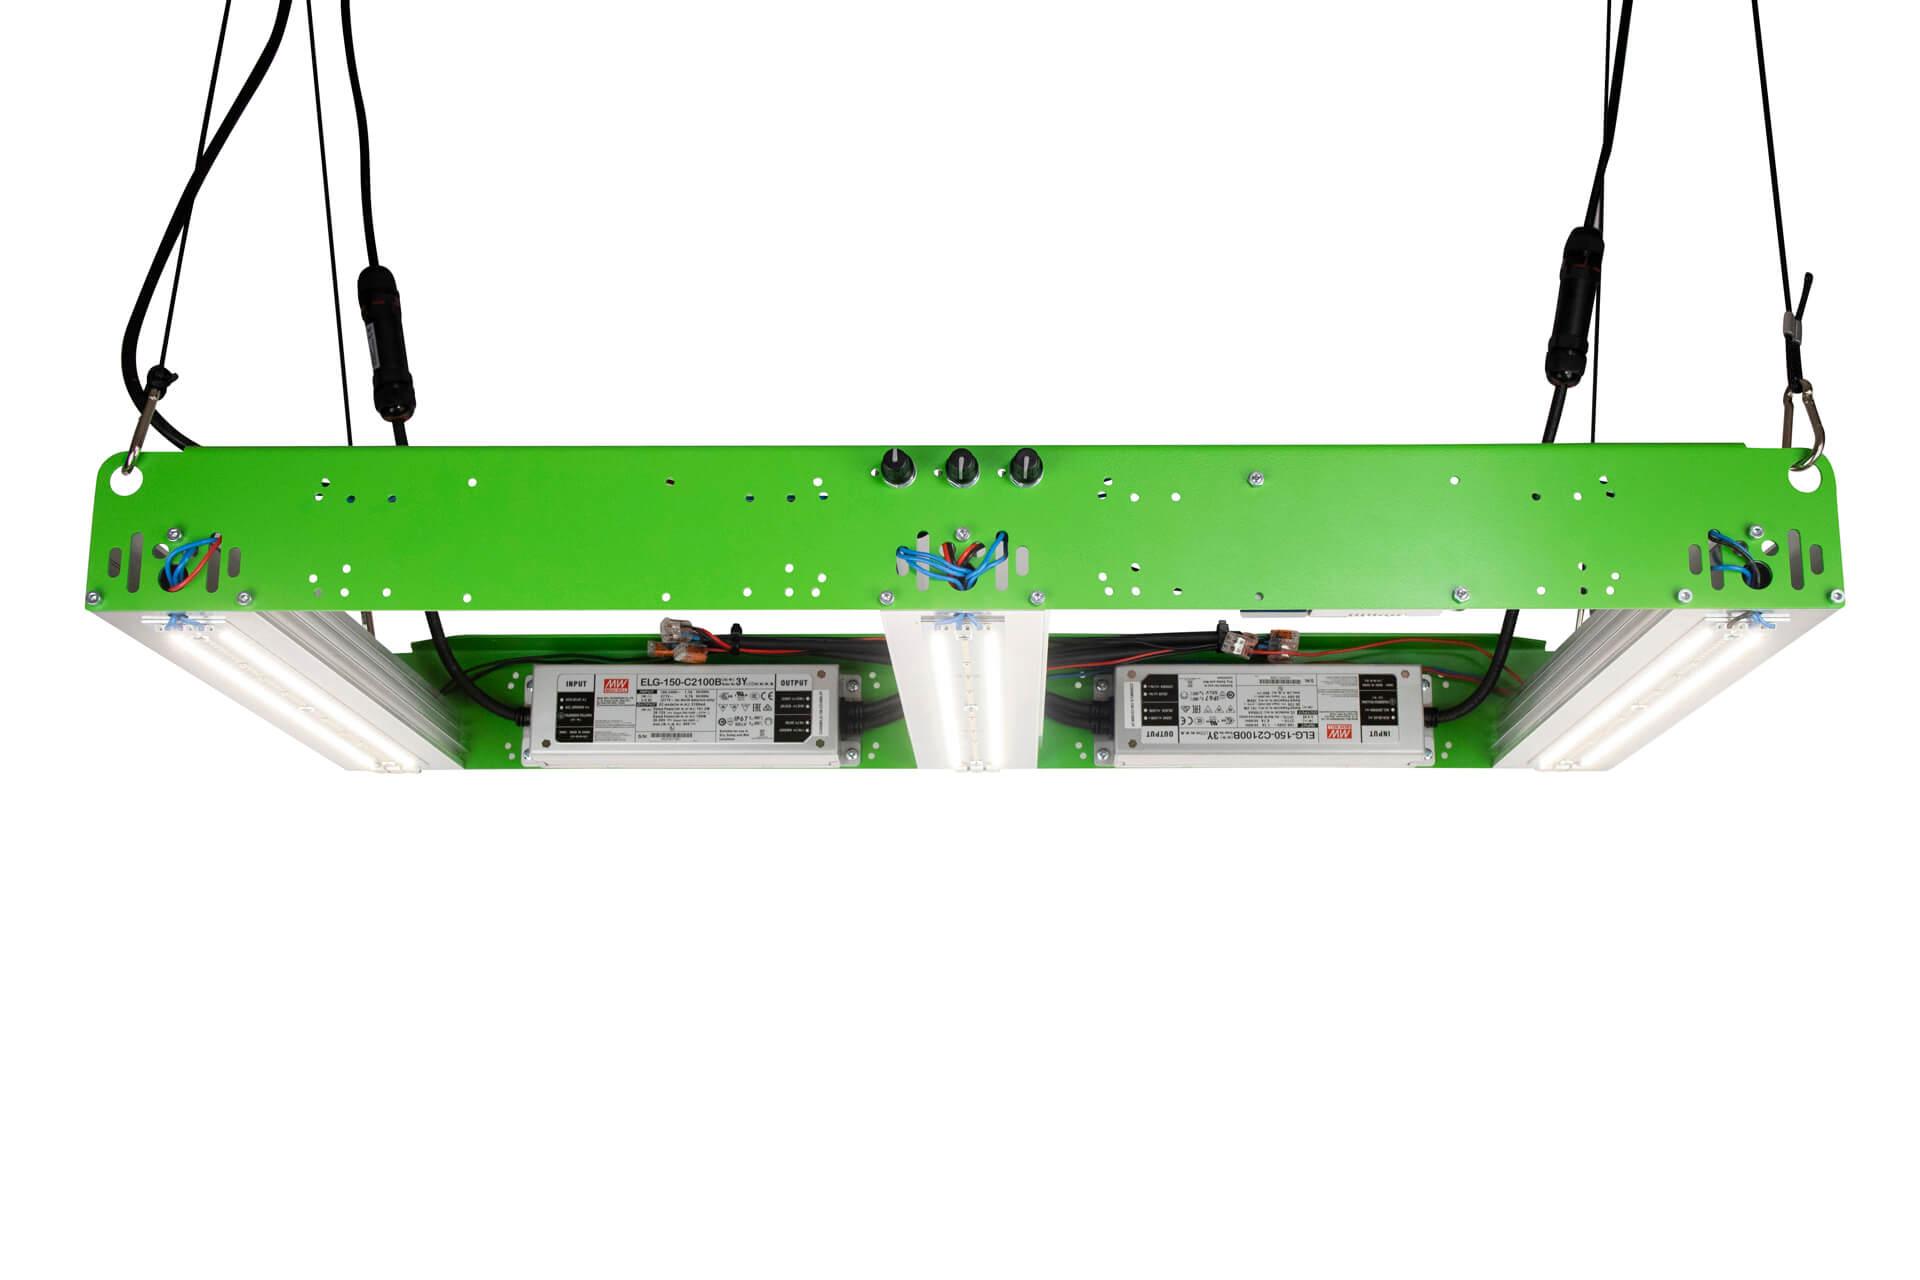 DIY-M-KIT-2-Series-short-225w-veg-channel-on-pro-emit